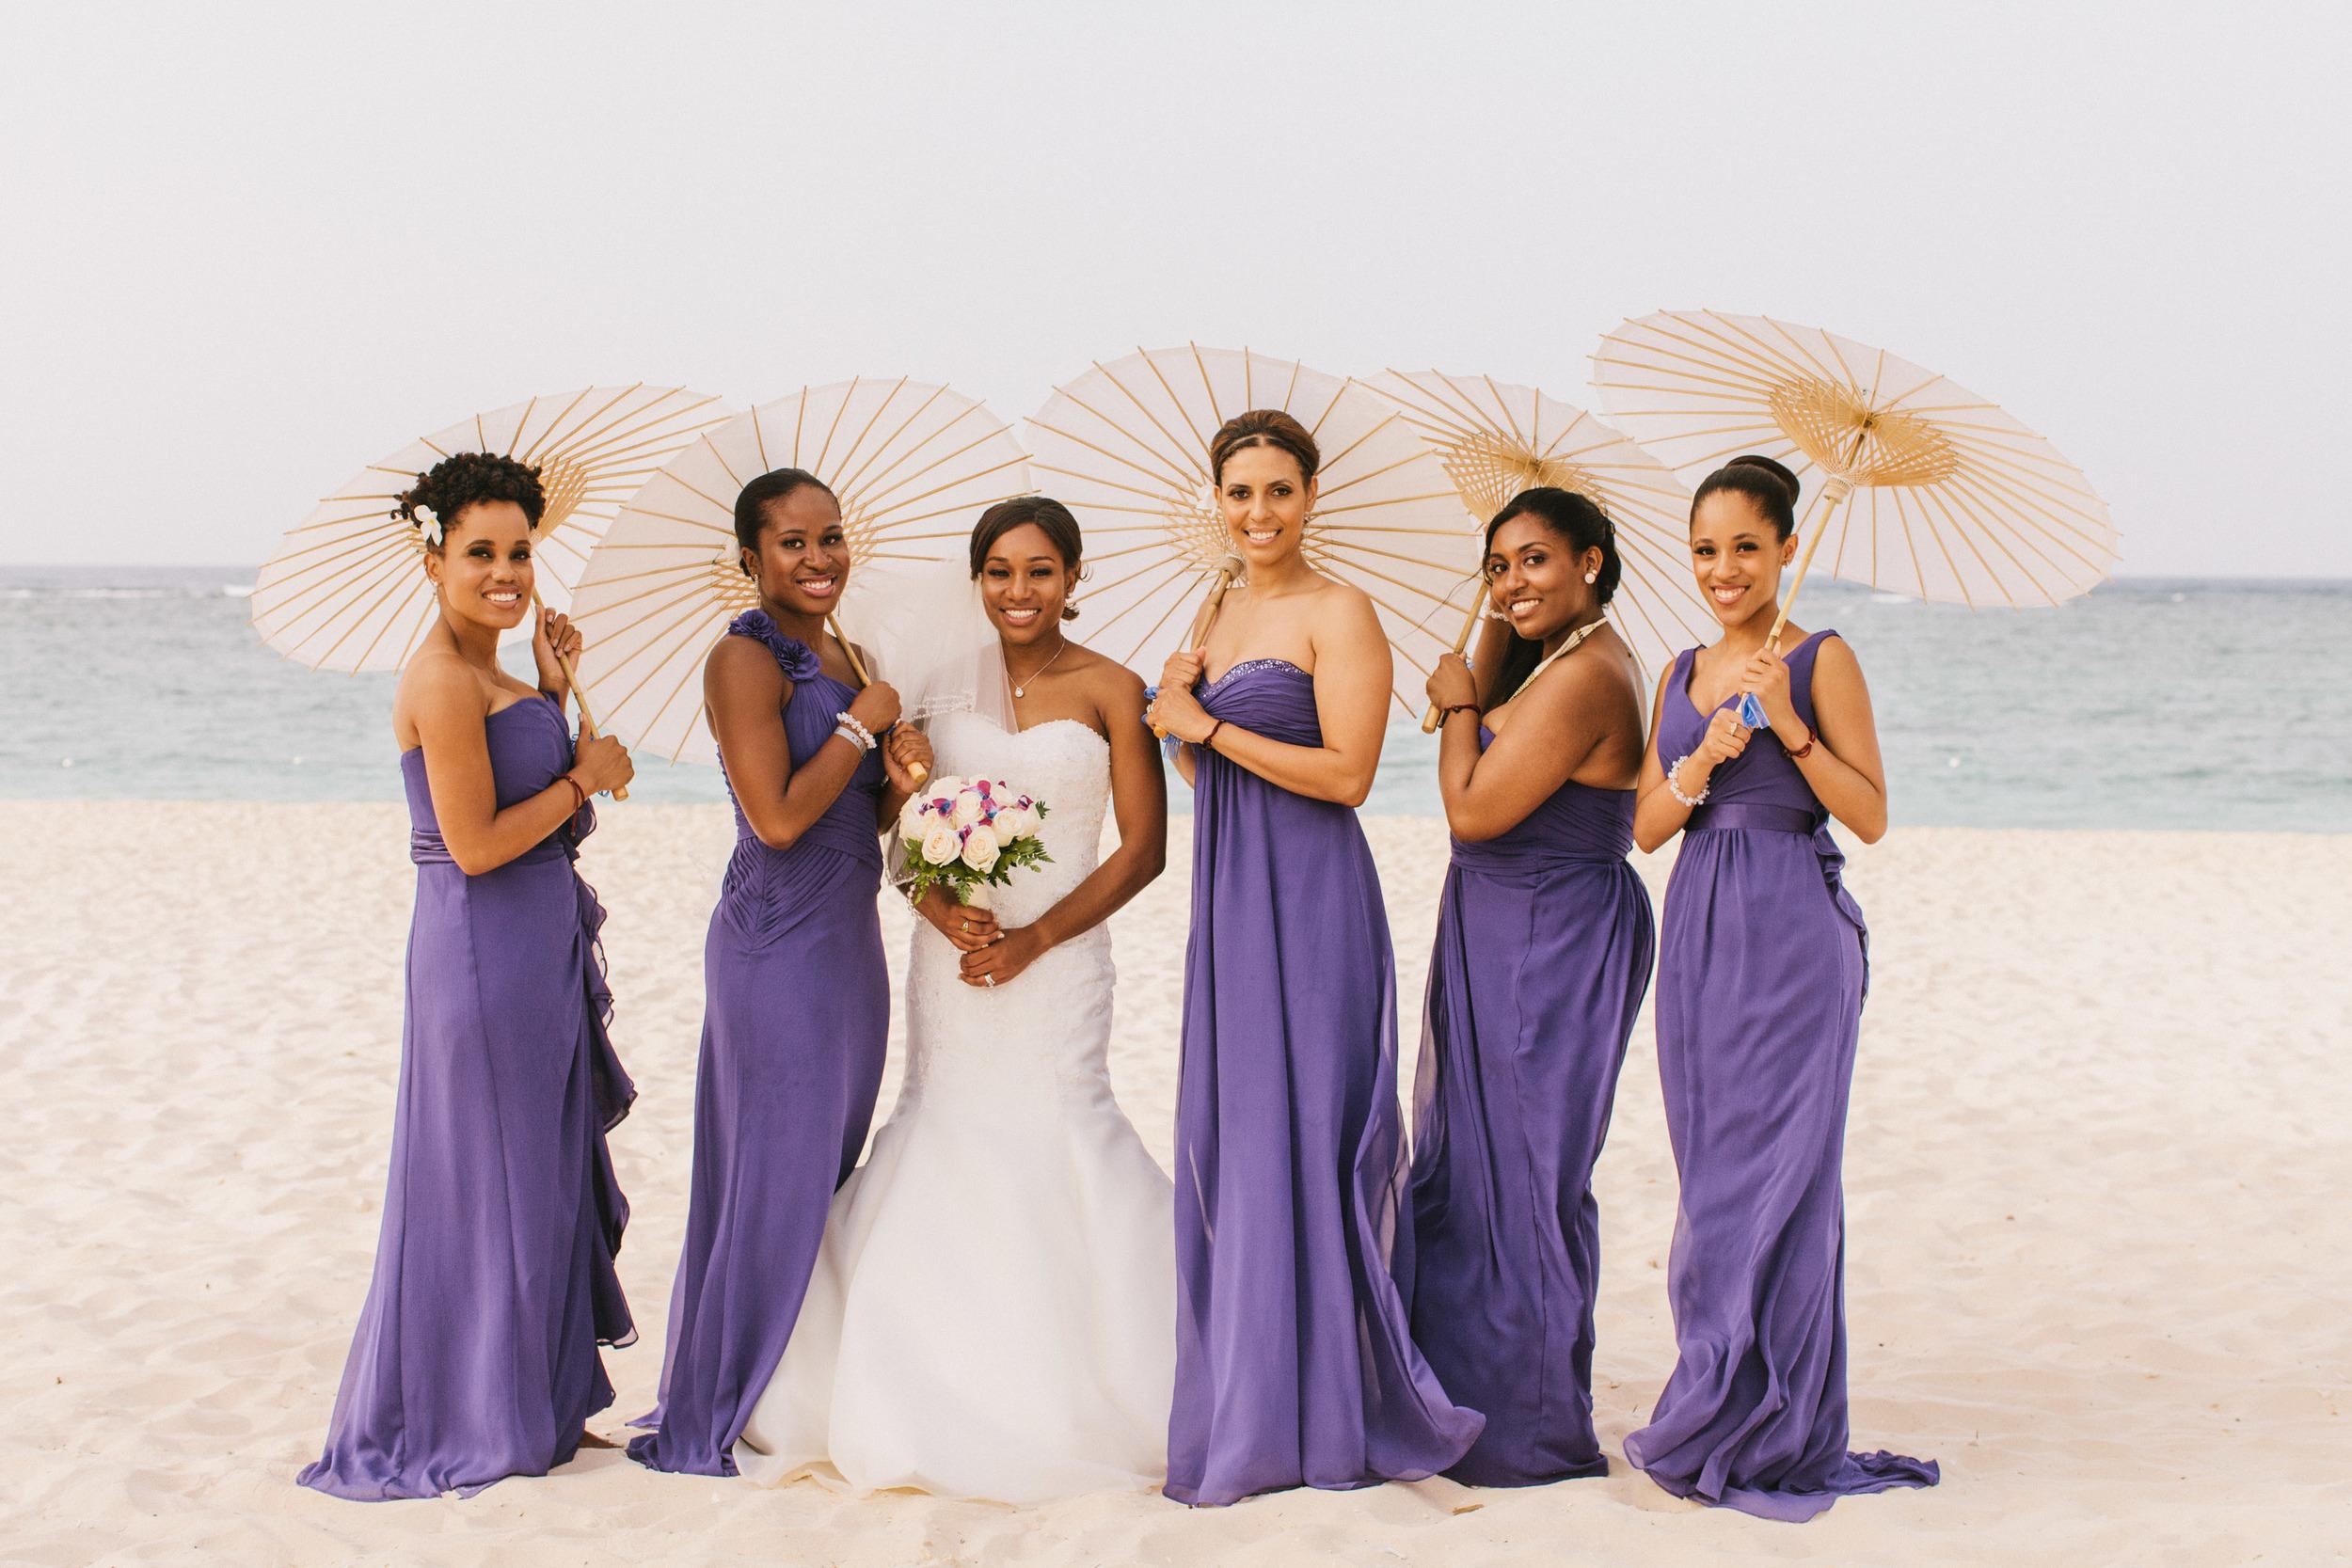 michael-rousseau-photography-dominican-republic-destination-wedding-cara-jason-colonial-majestic-dominican-republic102.jpg